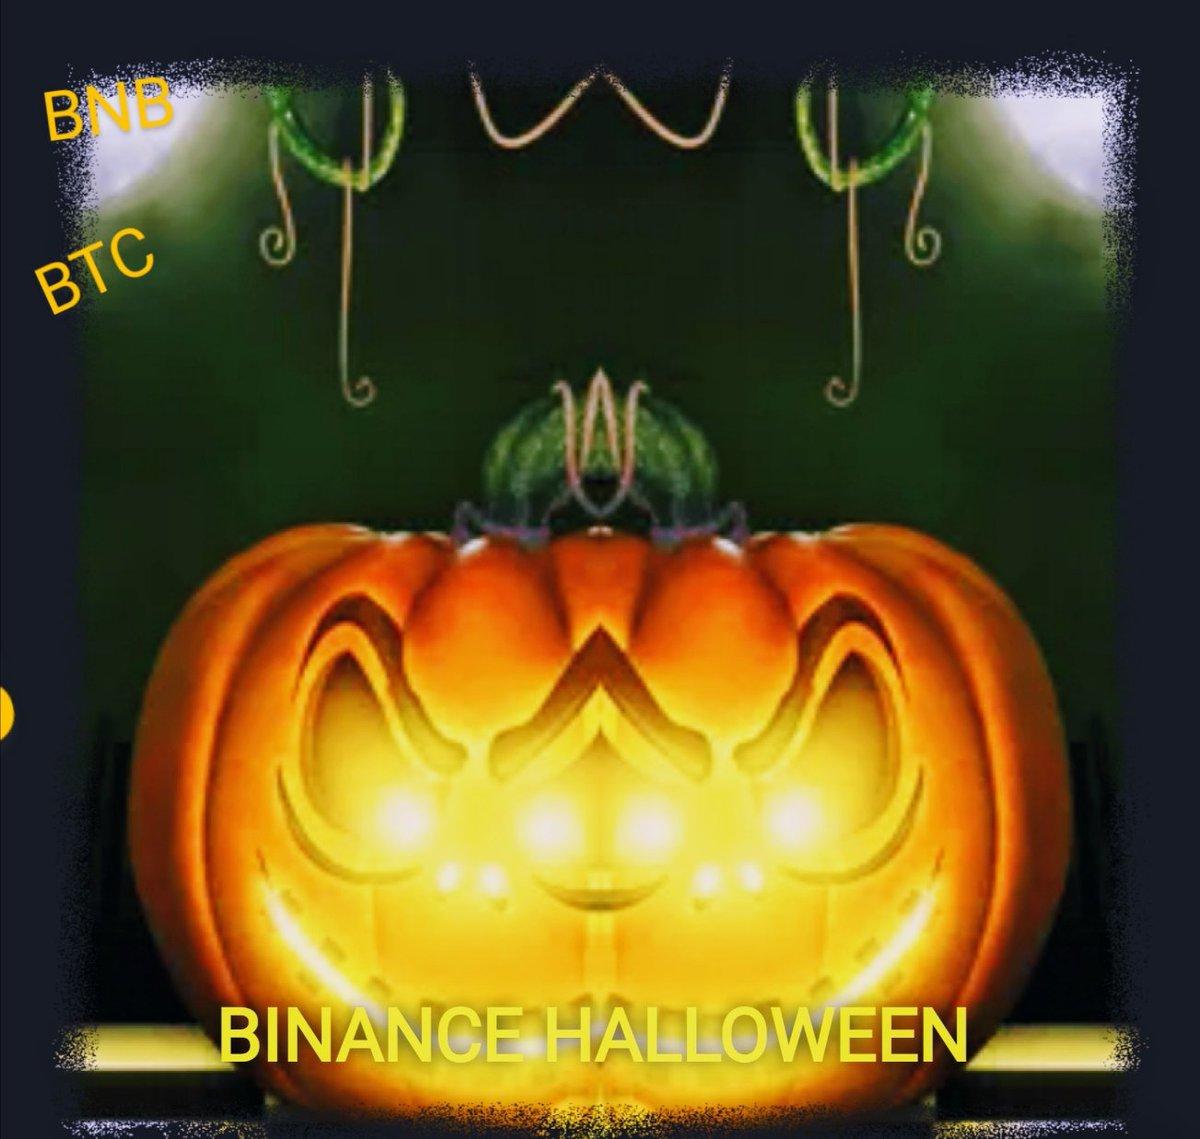 @binance #Halloween #binanceHalloween #BNB https://t.co/FdycPrfB8B